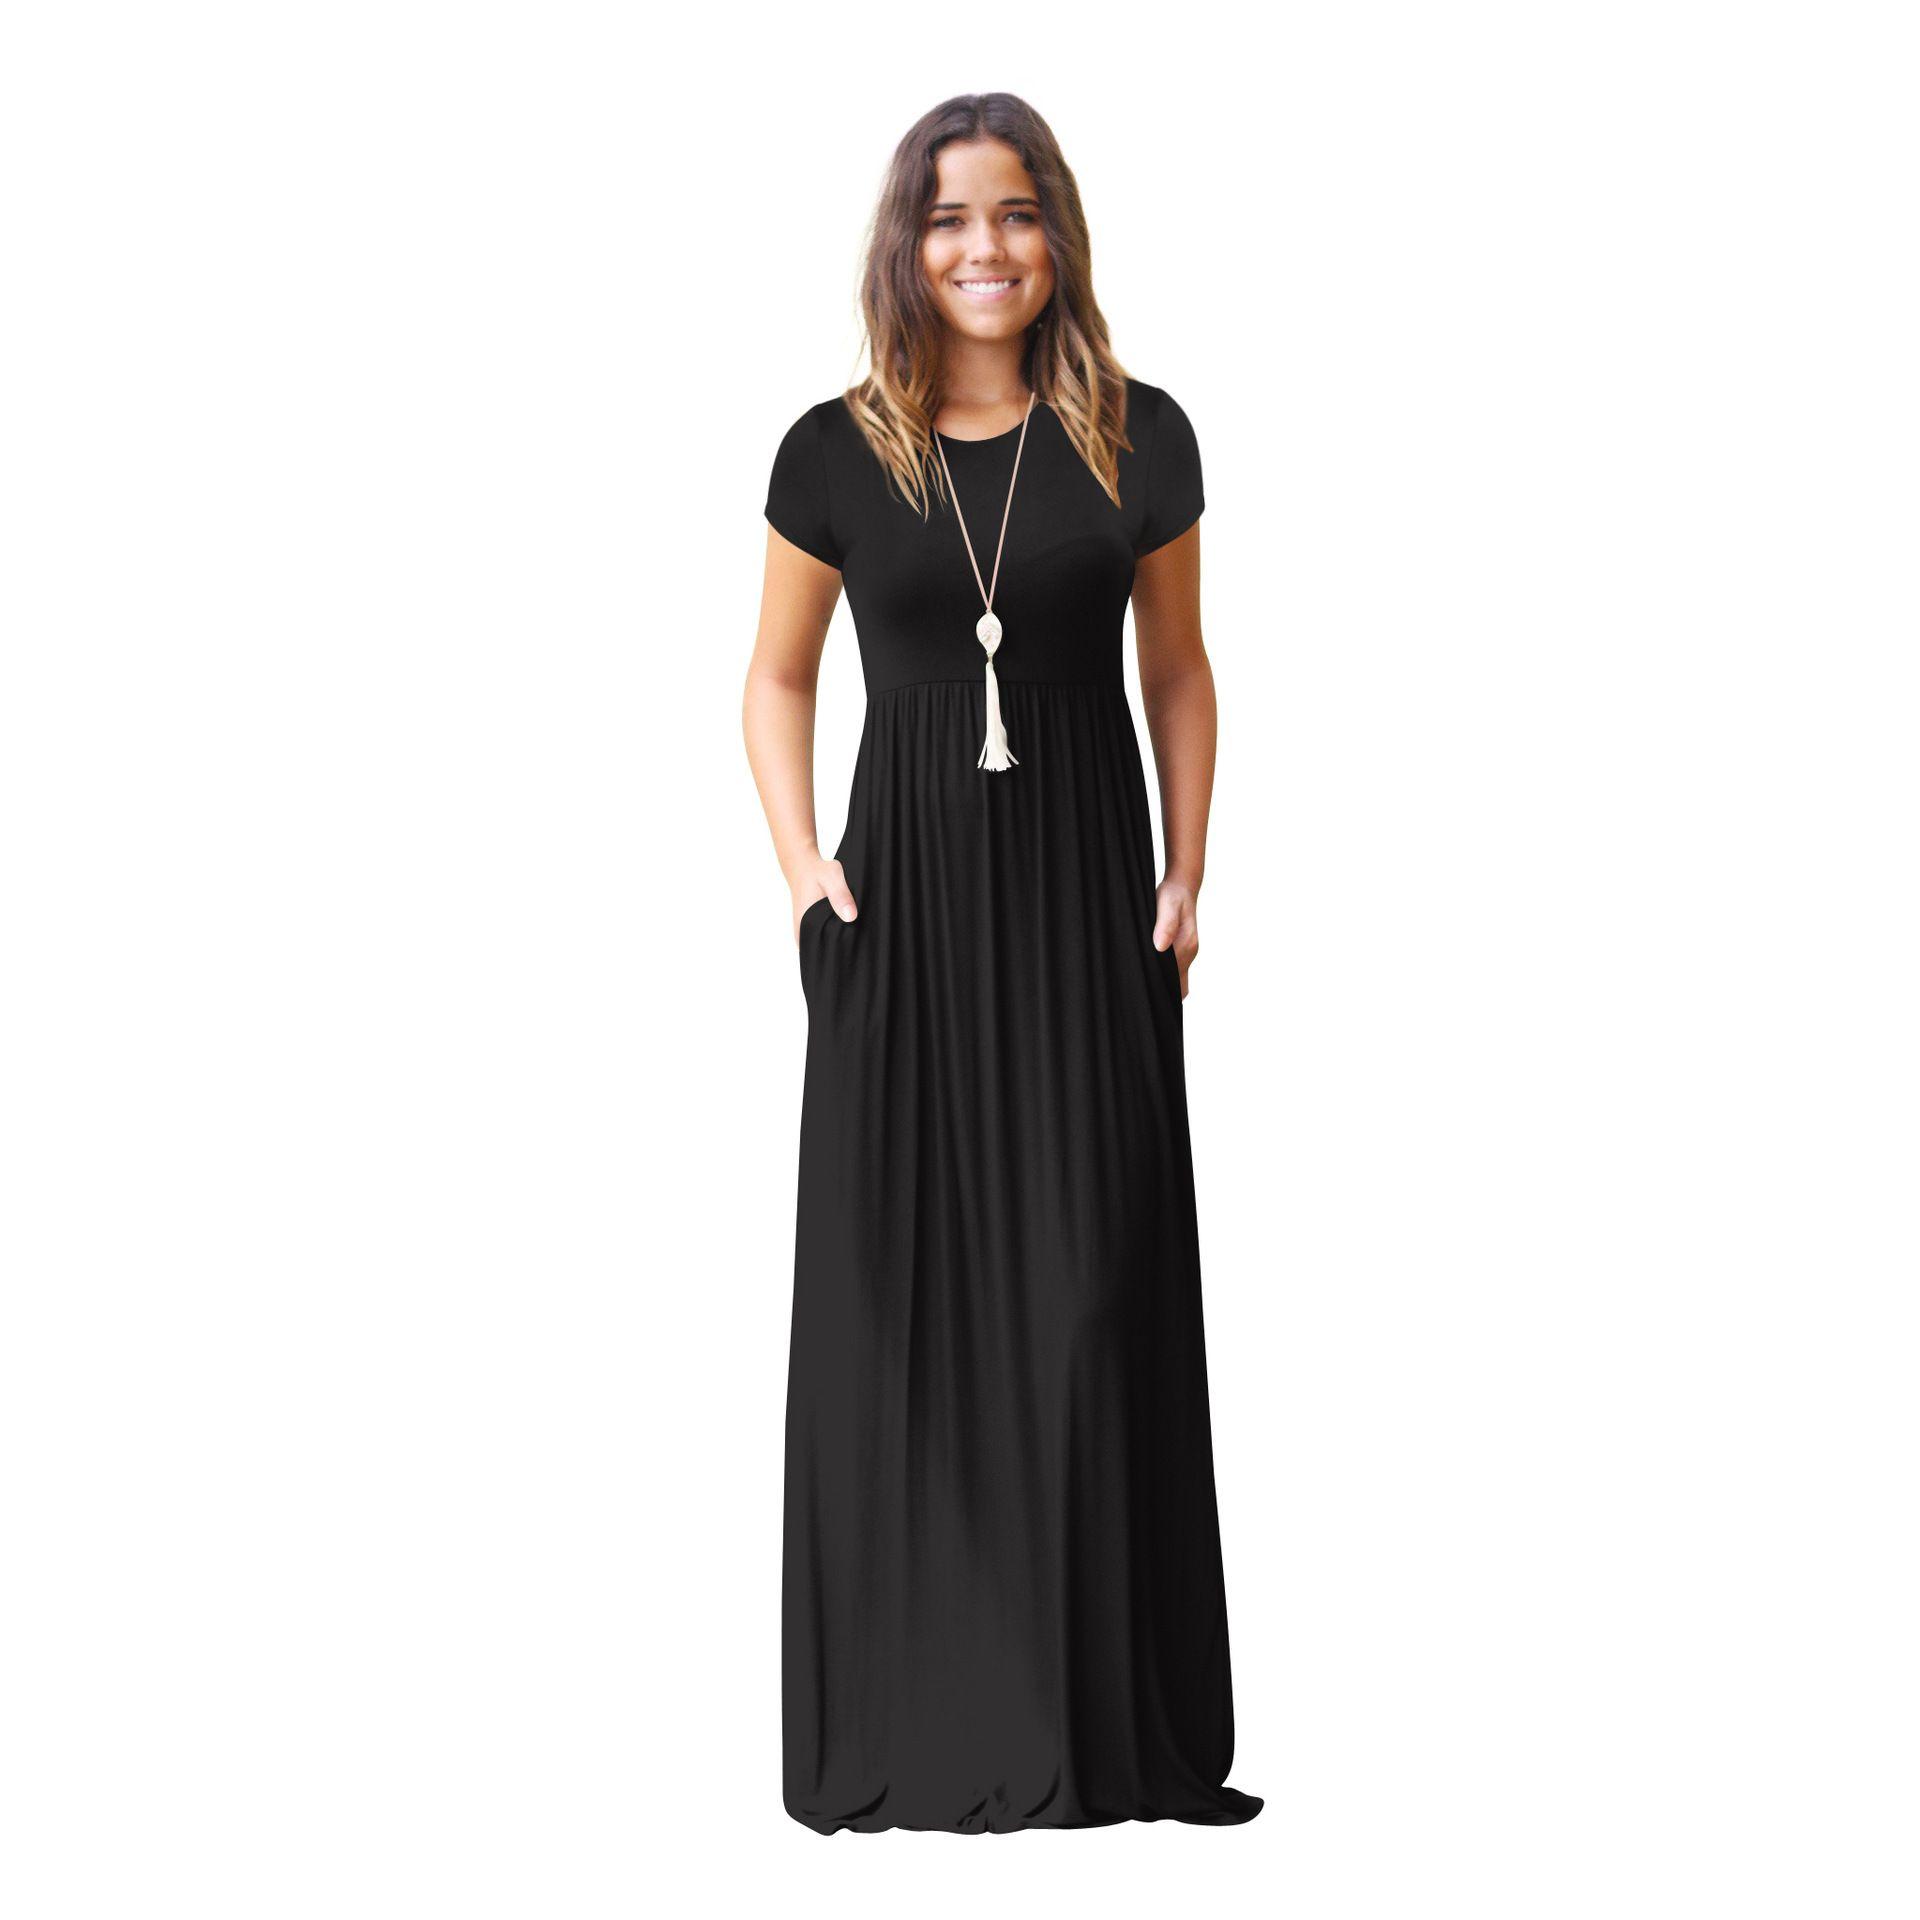 Women's Short Sleeve Maxi Dress with Pockets Plain Loose Swing Casual Floor Length Long Dresses